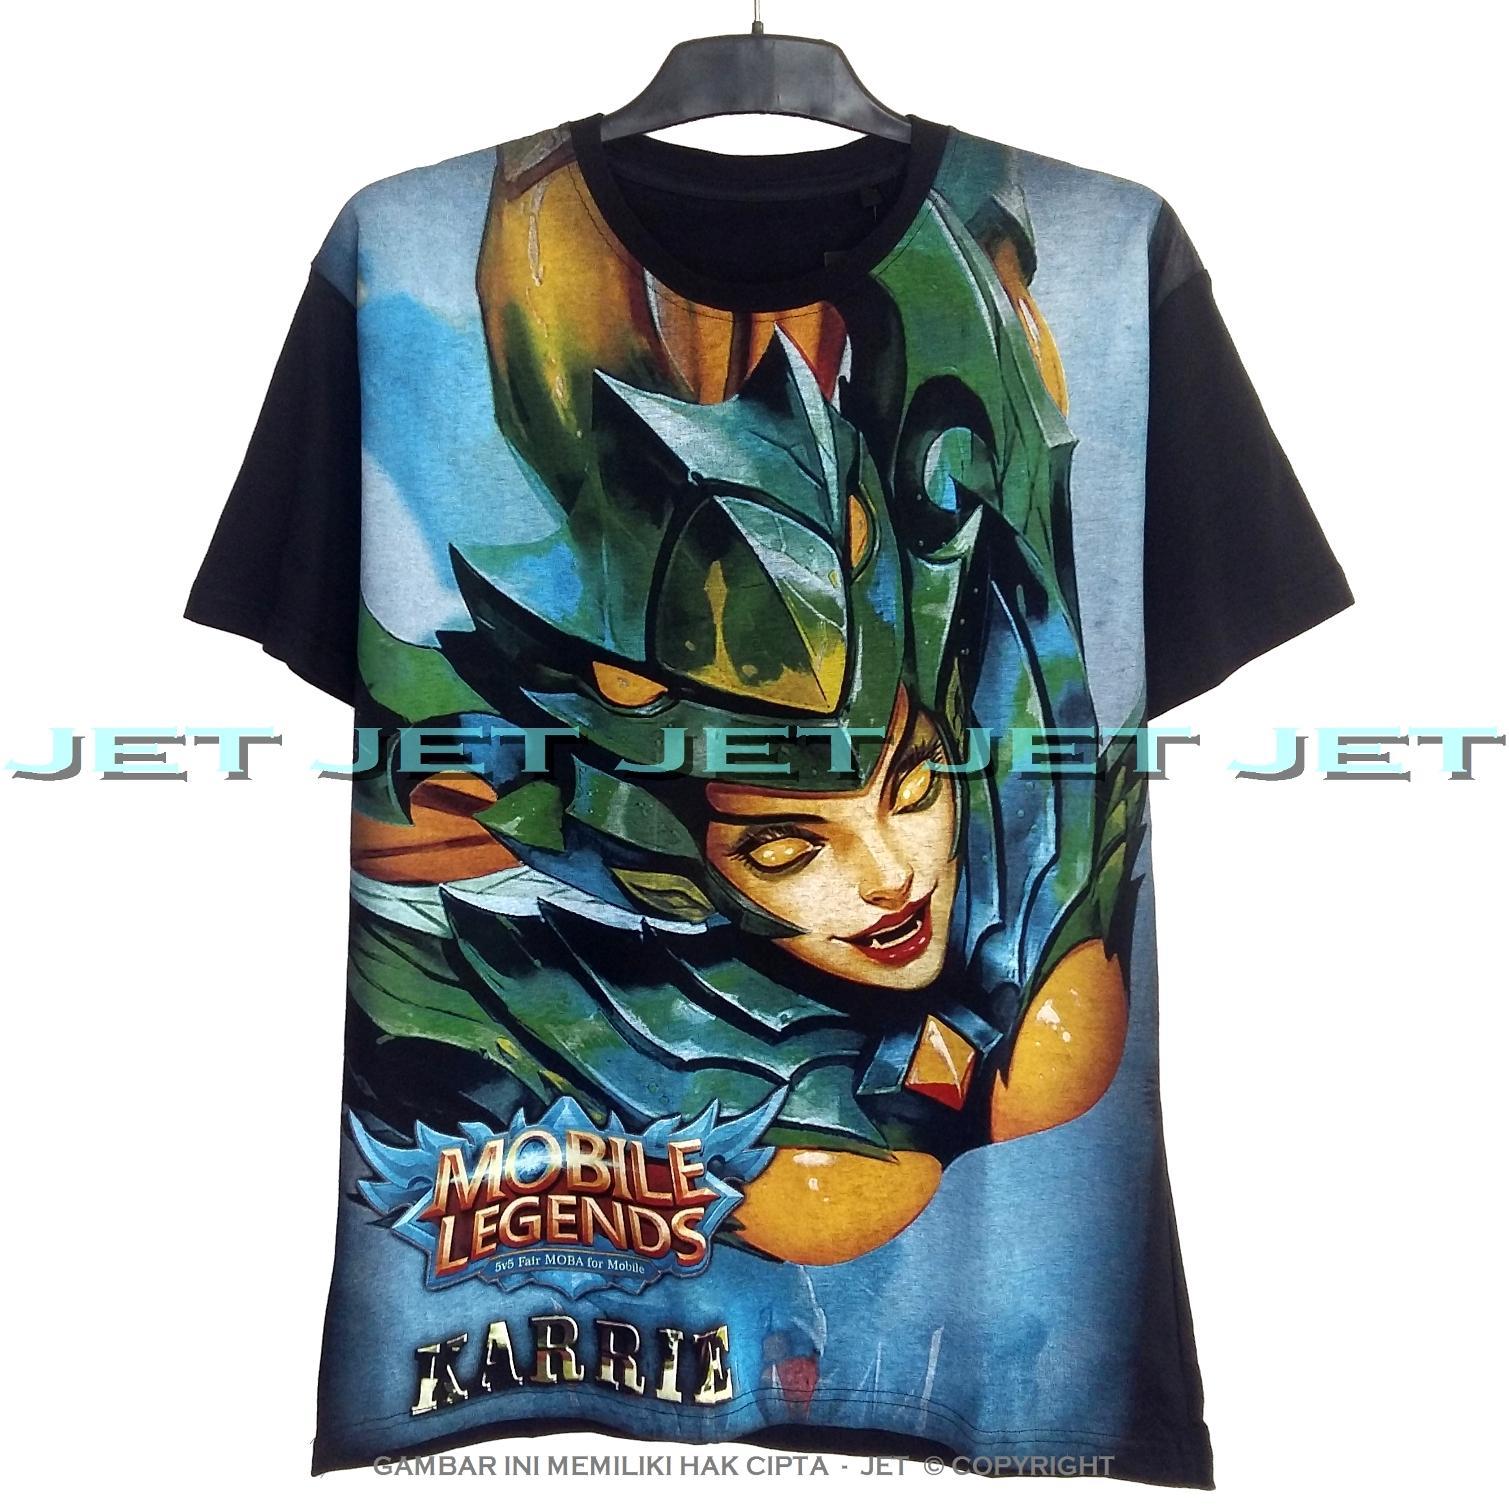 JeT - Black T-Shirt Premium Cotton Combed Karrie Bladed Mantis Mobile Legends Skin